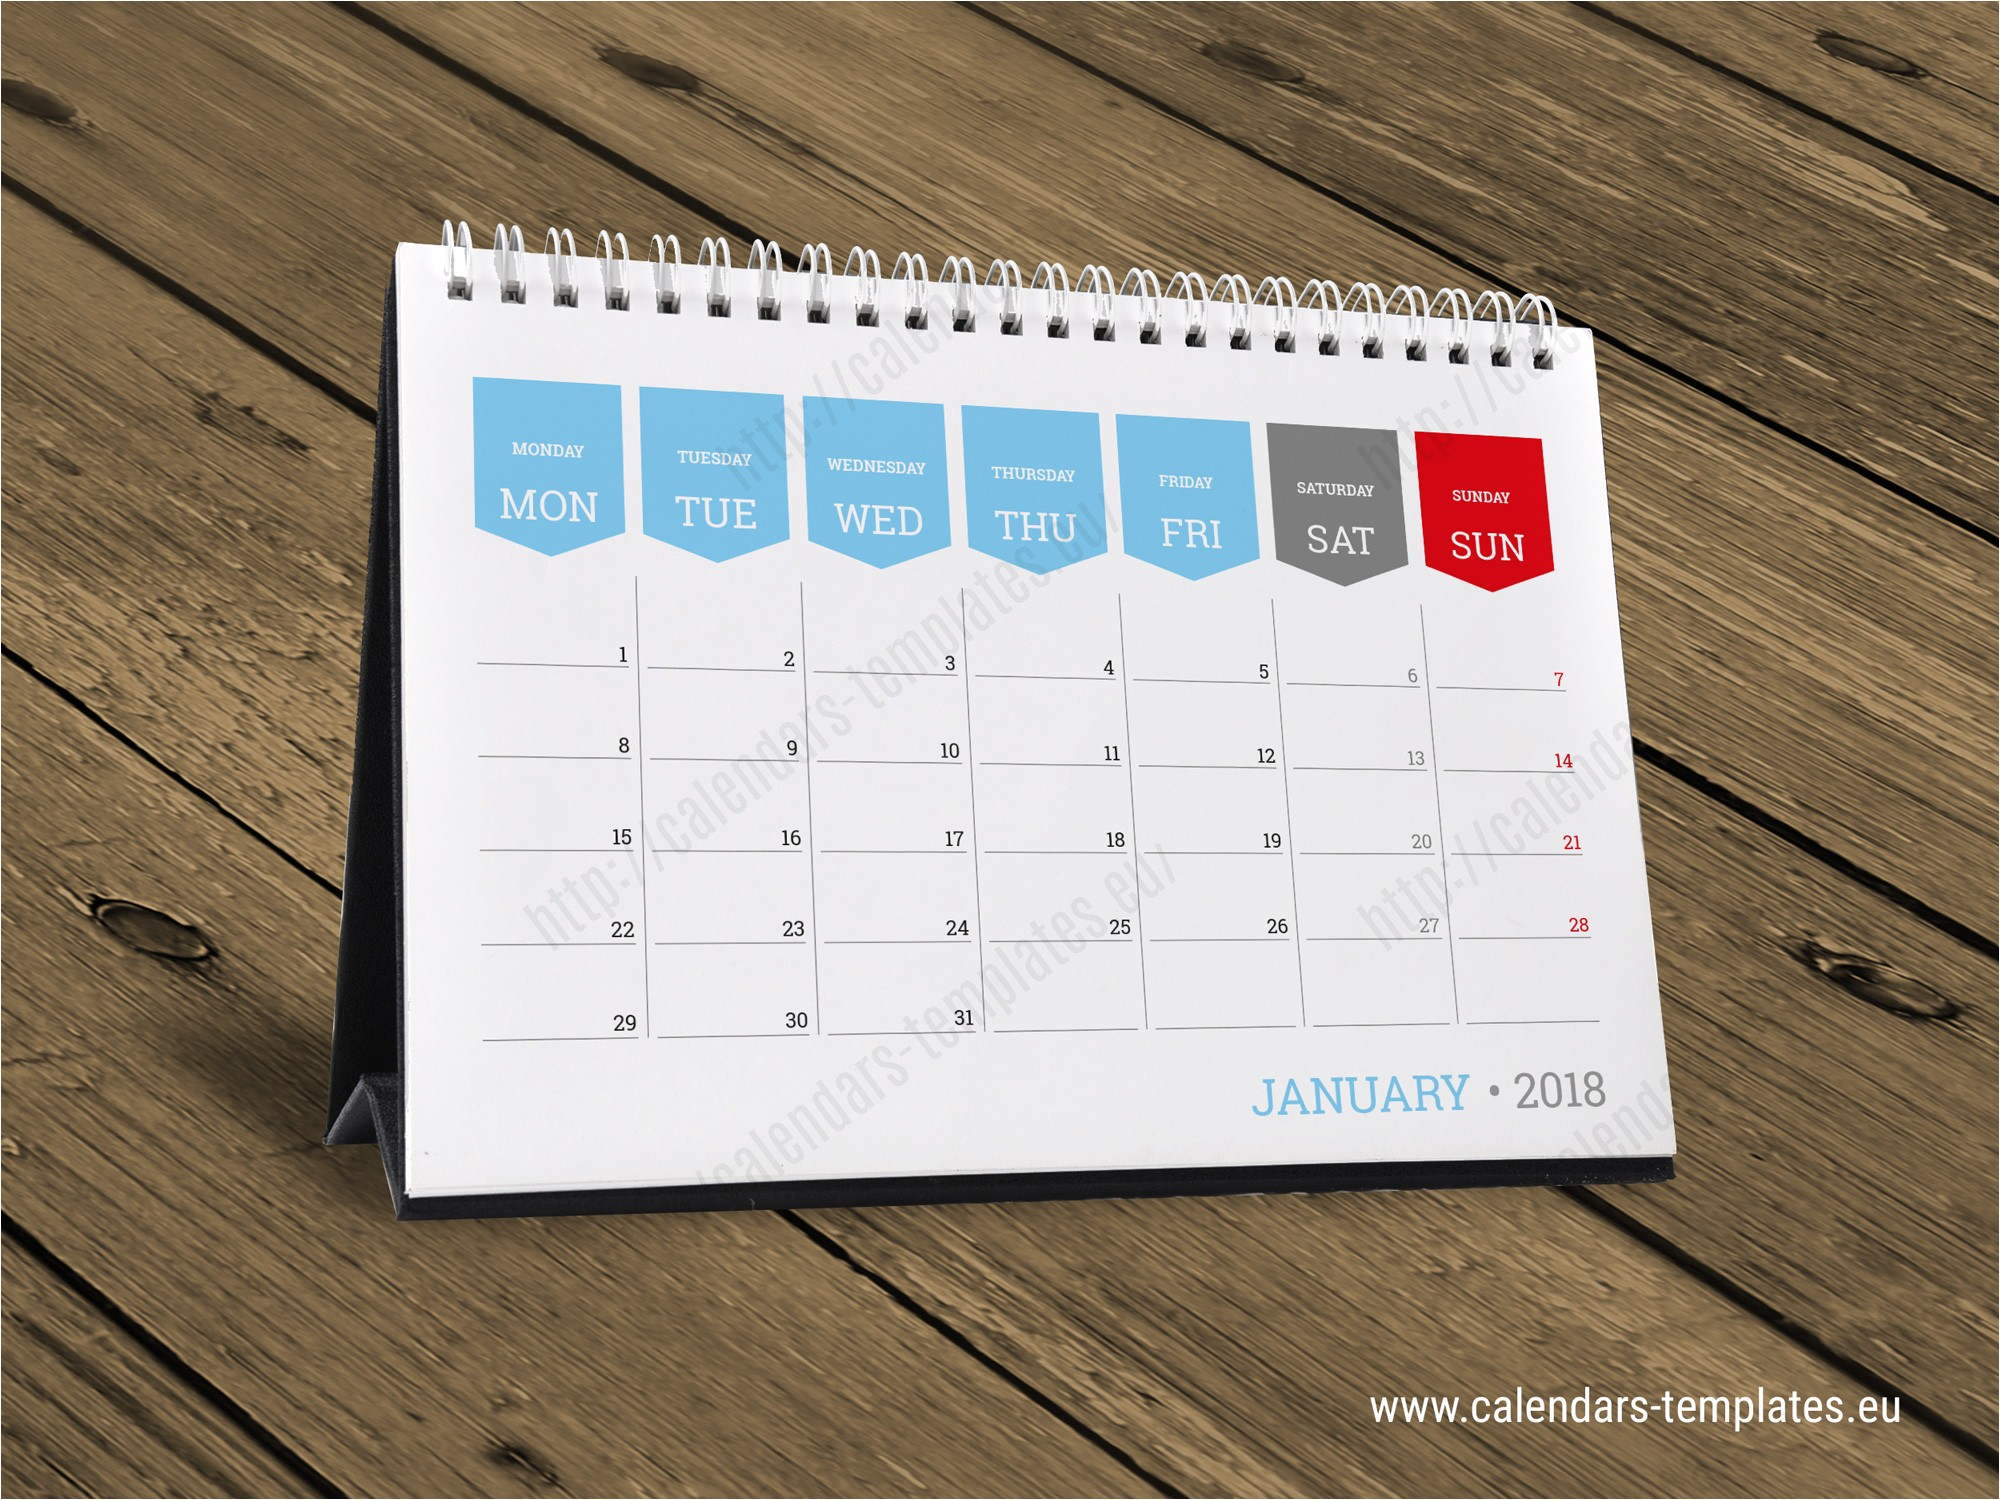 monthly desktop calendar 2018 kb10 w3